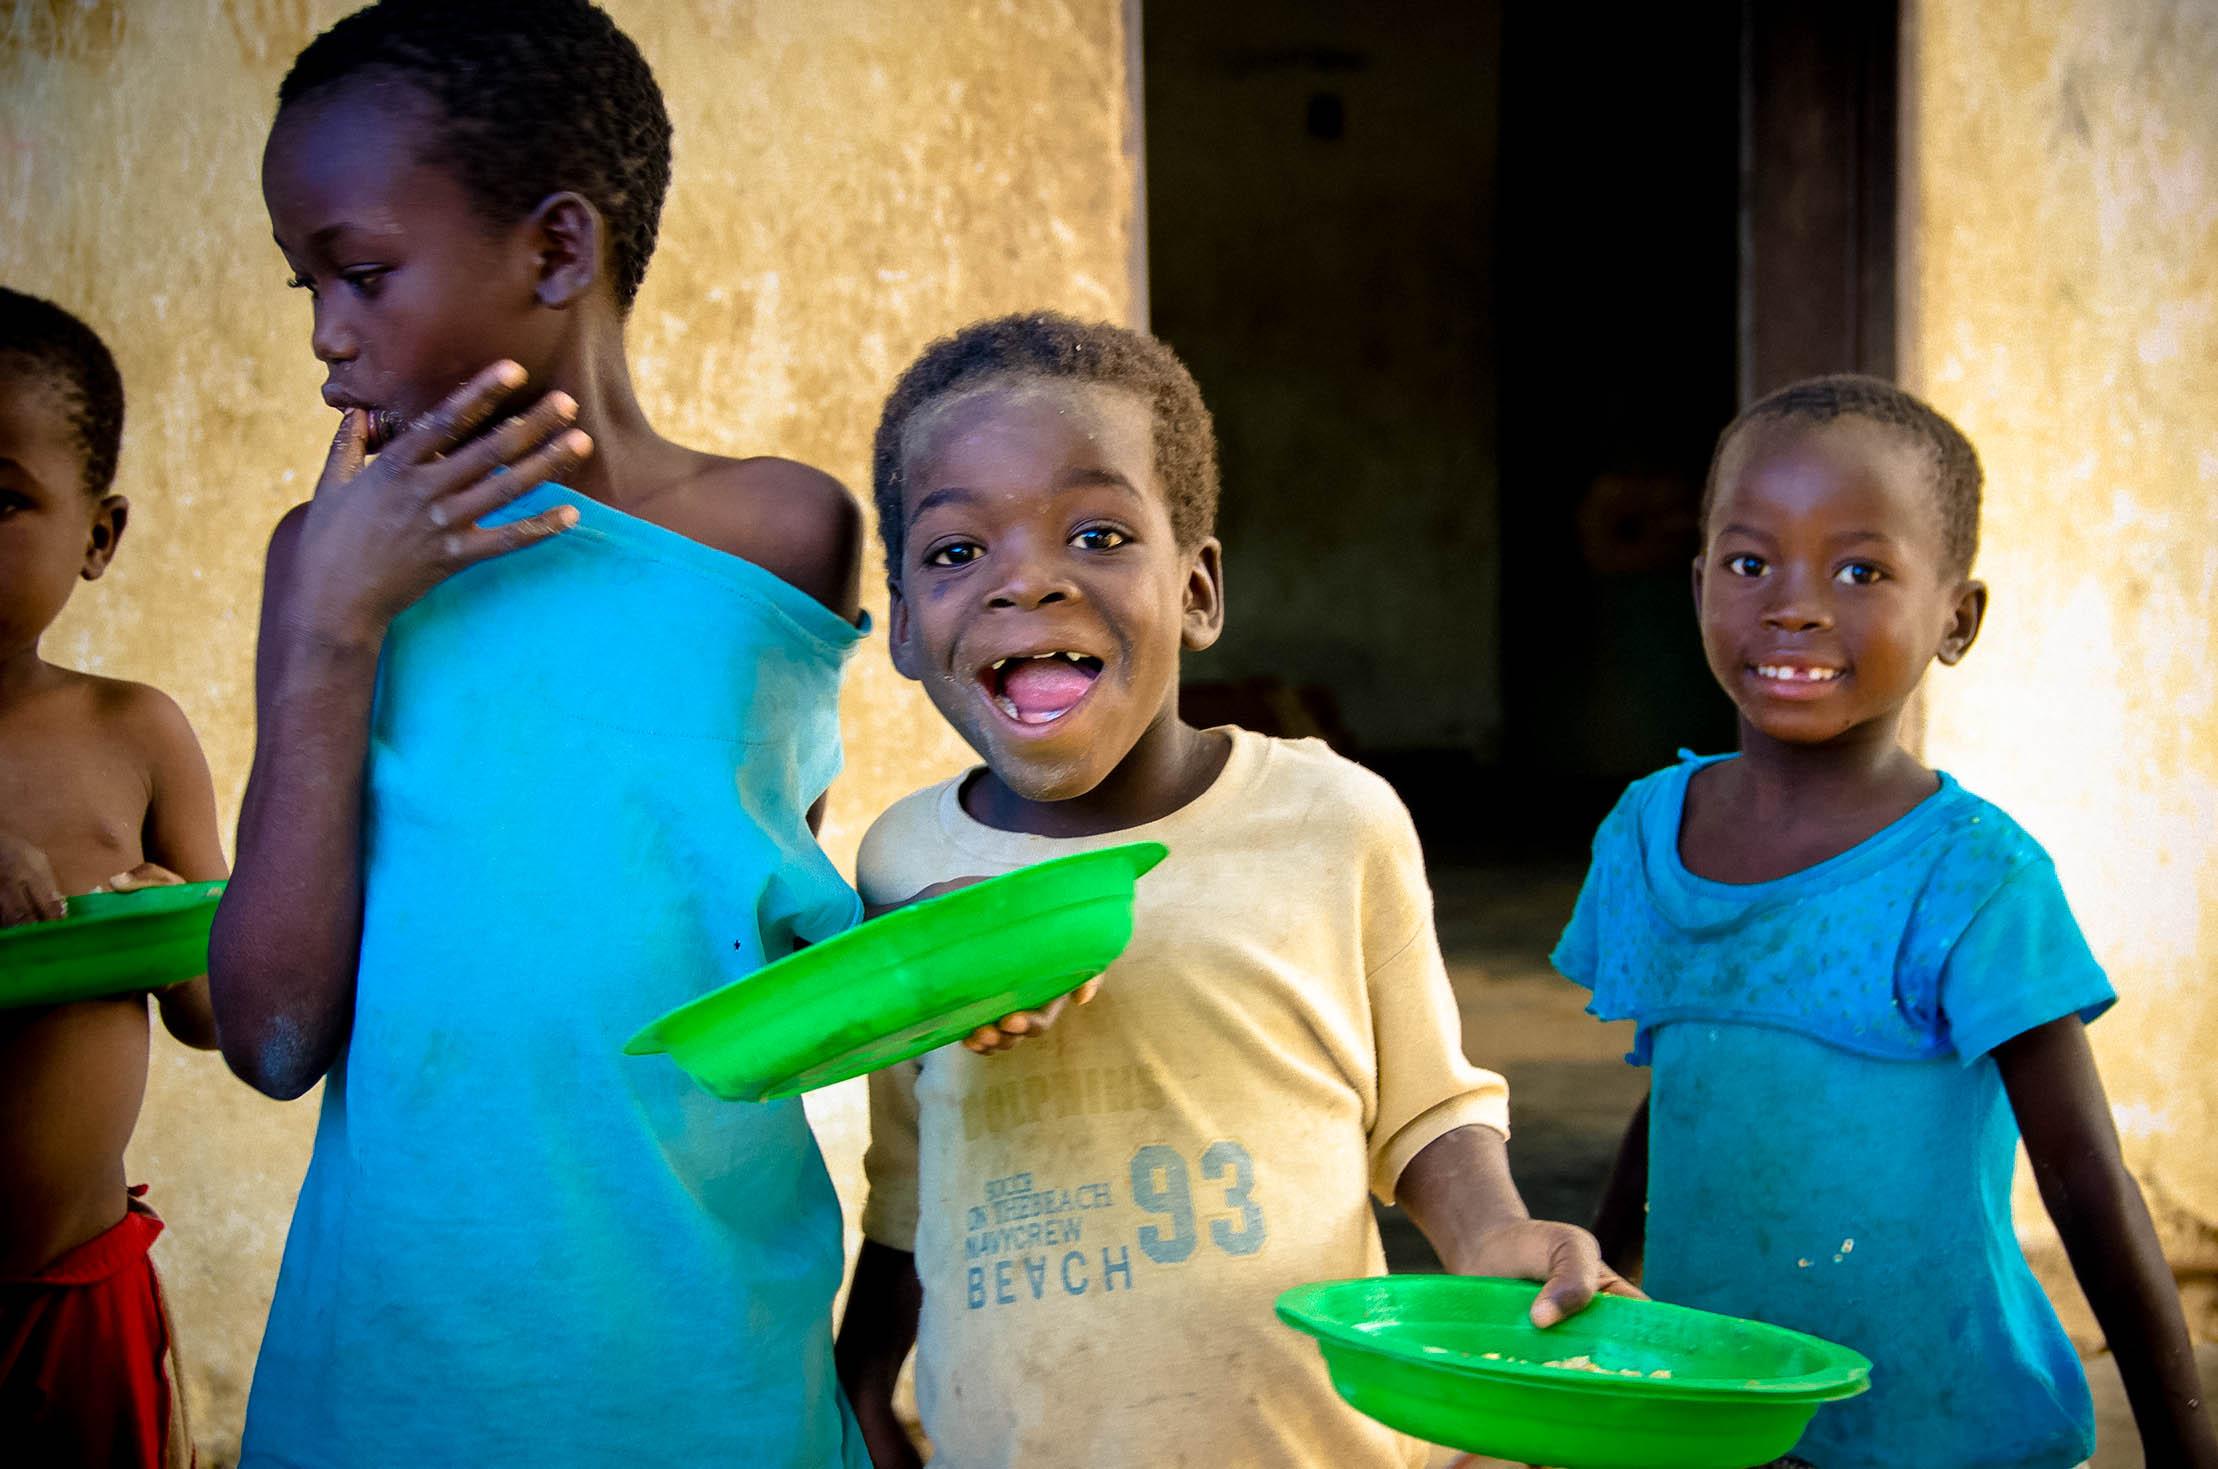 Child Malnutrition in Malawi